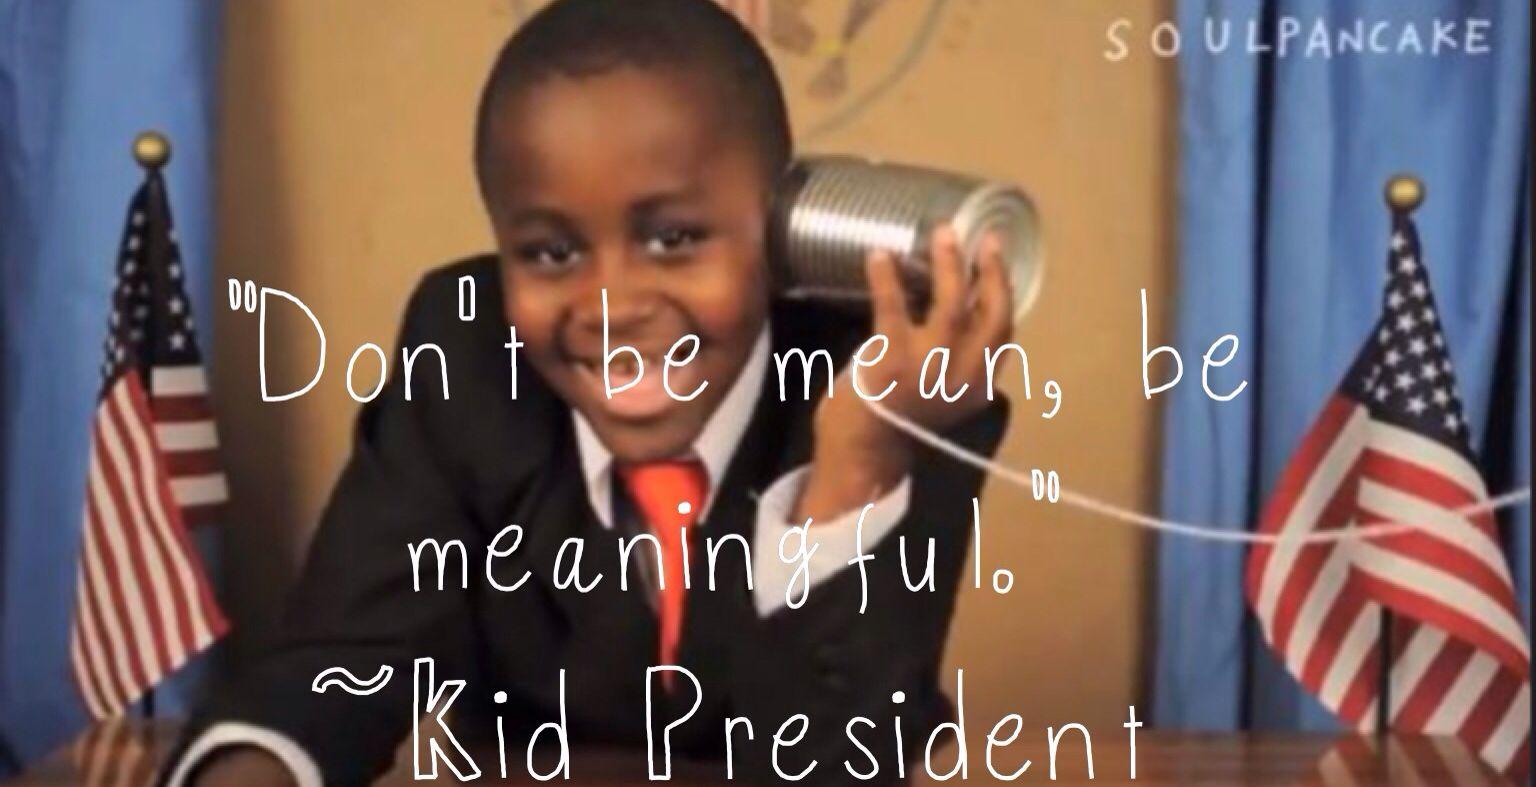 Kid President Quote   Quotes   Pinterest   Kid president quotes ...